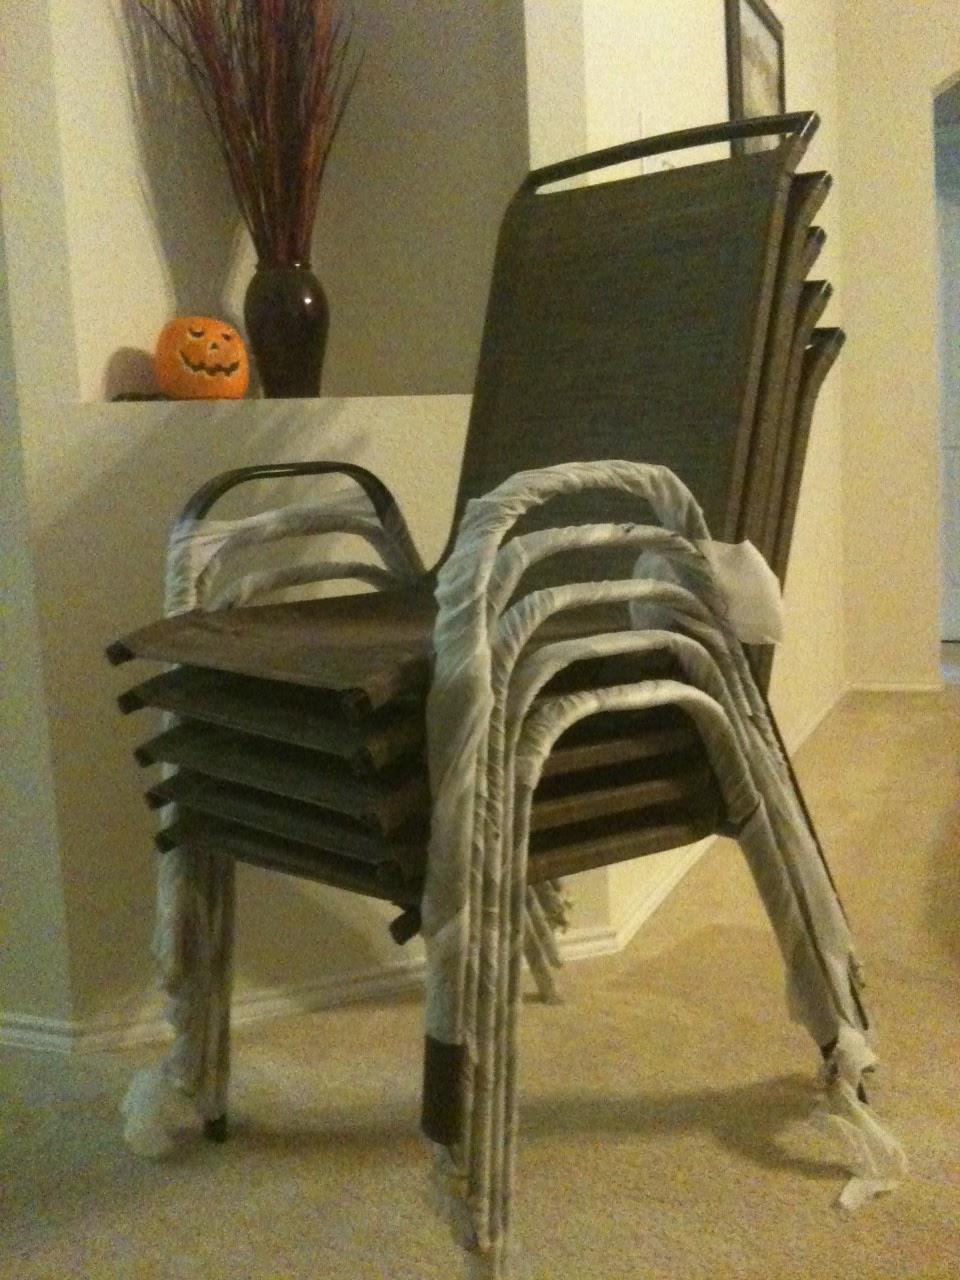 Lawn Amp Garden Chairs 0 10 Each At Dollar General